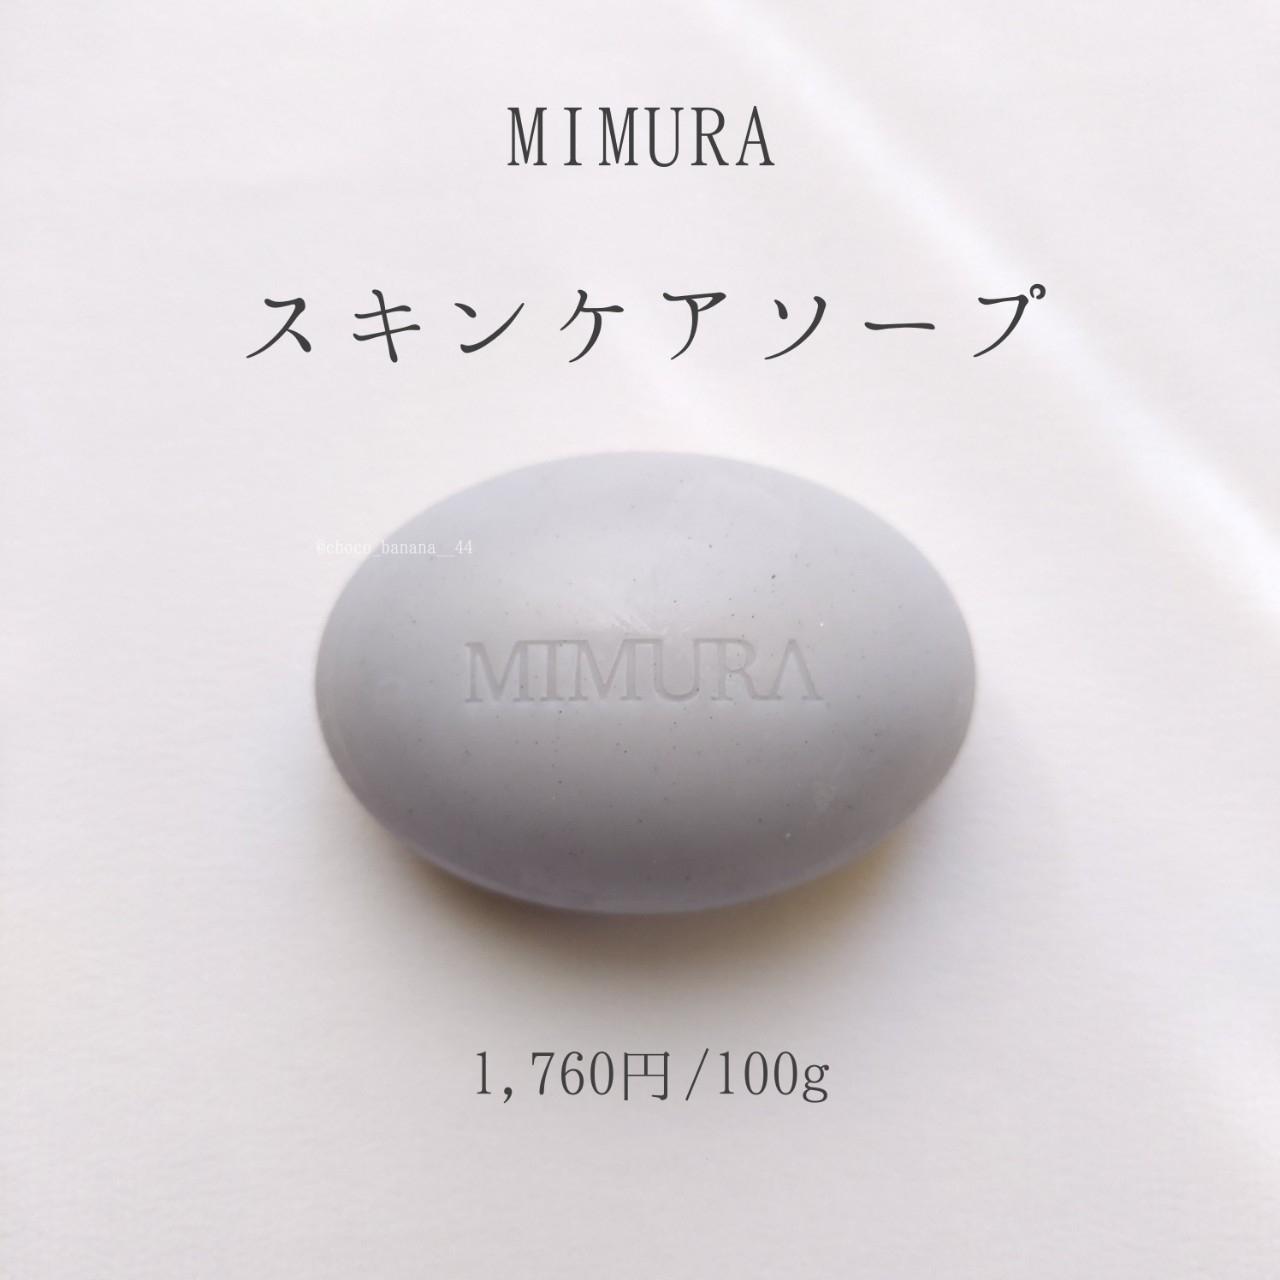 MIMURA(ミムラ) スキンケアソープの良い点・メリットに関するししさんの口コミ画像2